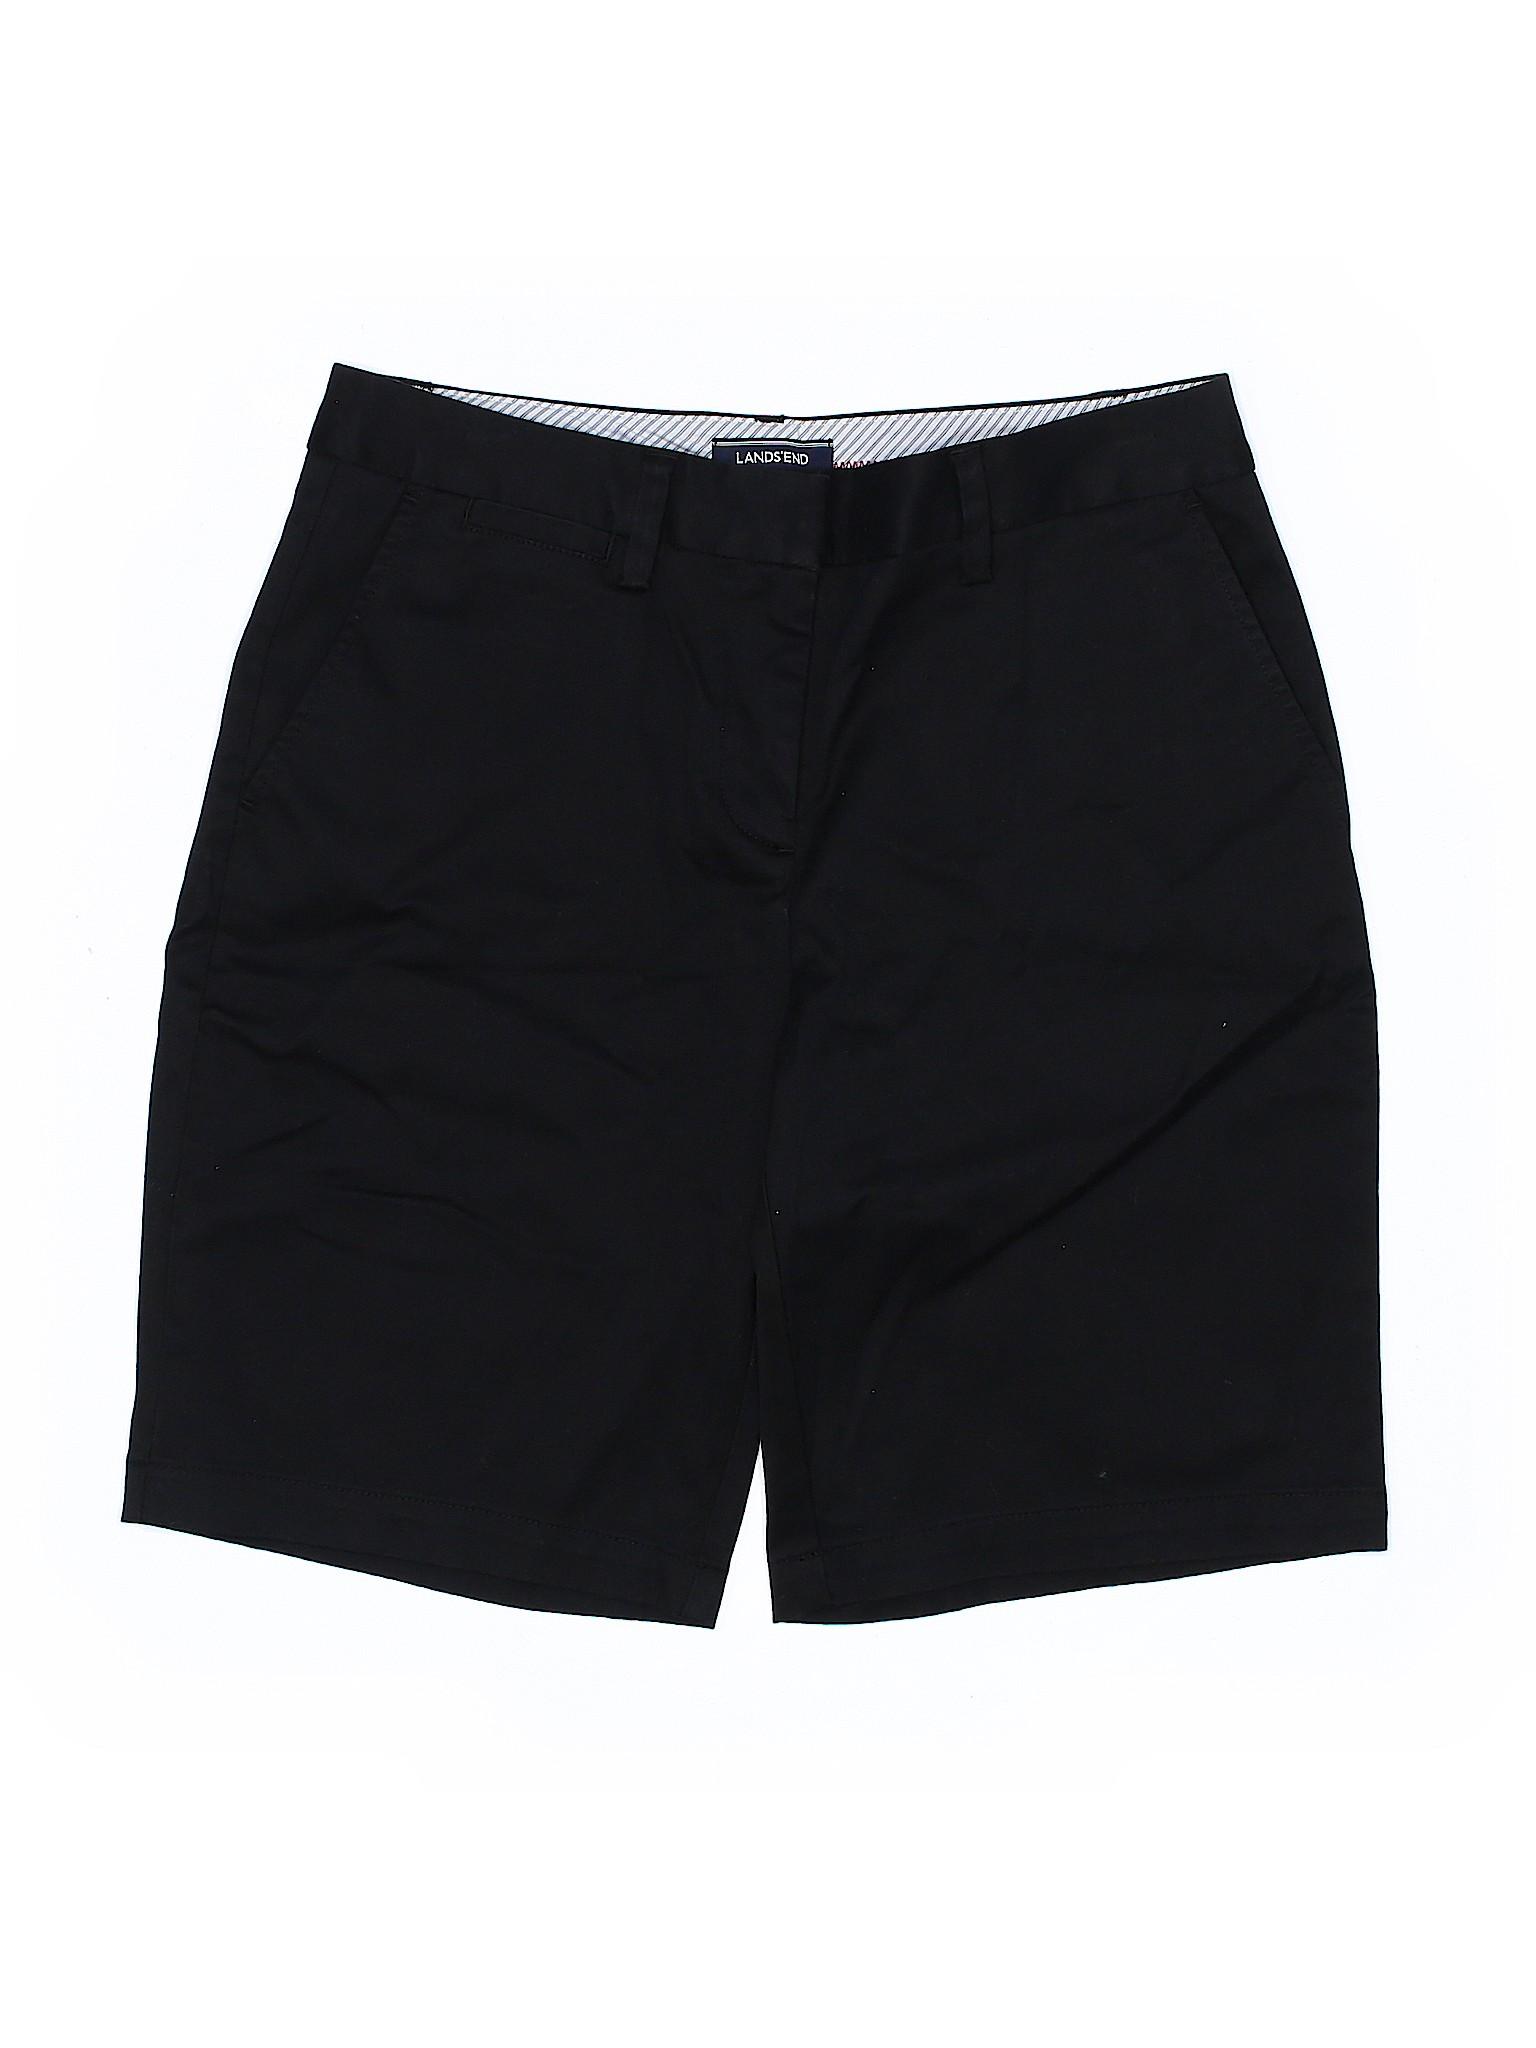 Shorts Khaki End Lands' Khaki Shorts End End Shorts Khaki Boutique Boutique Lands' Lands' Boutique dq8wgU4d